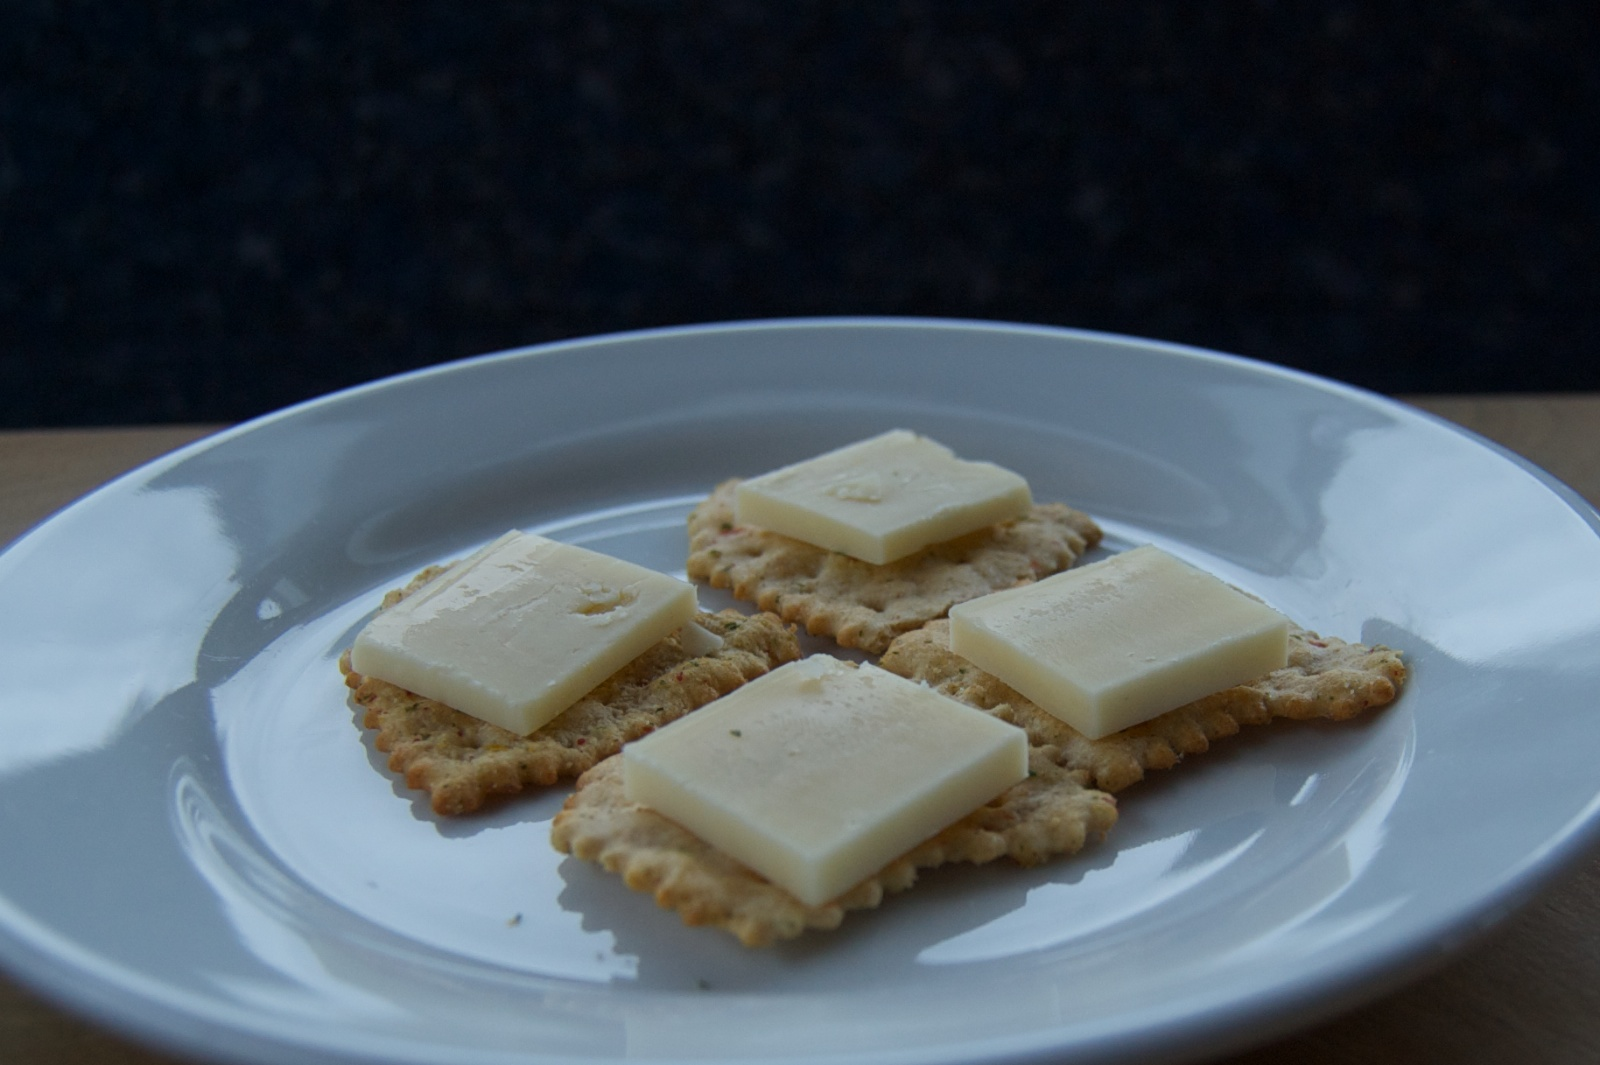 http://blog.rickk.com/food/2013/01/09/ate.2013.01.09.s.jpg